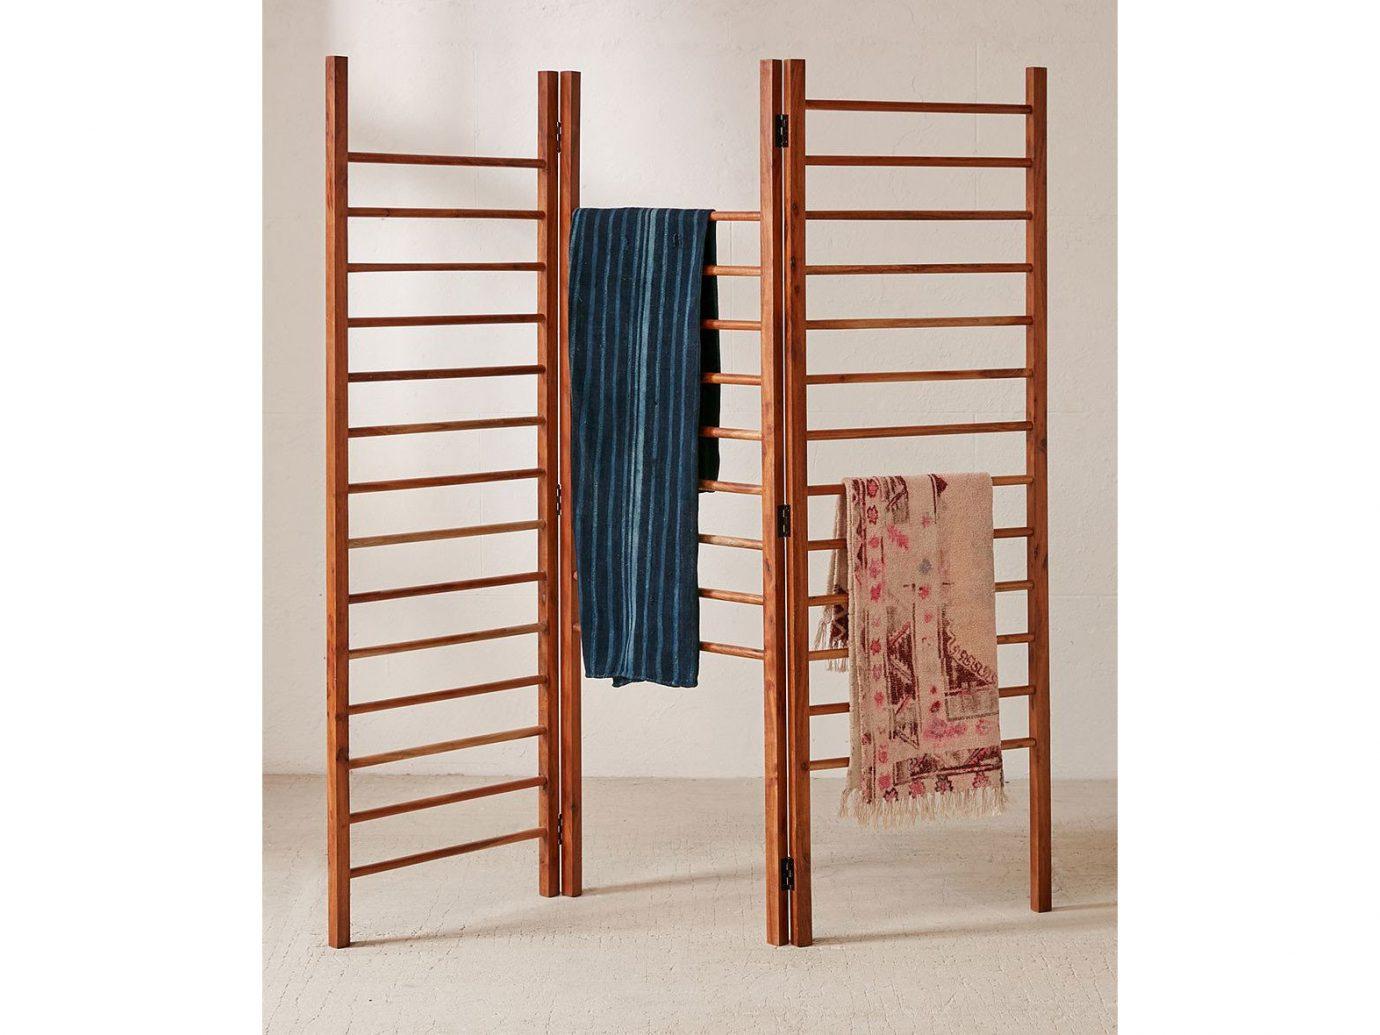 City Copenhagen Kyoto Marrakech Palm Springs Style + Design Travel Shop Tulum building clothes hanger furniture product design wood product shelf